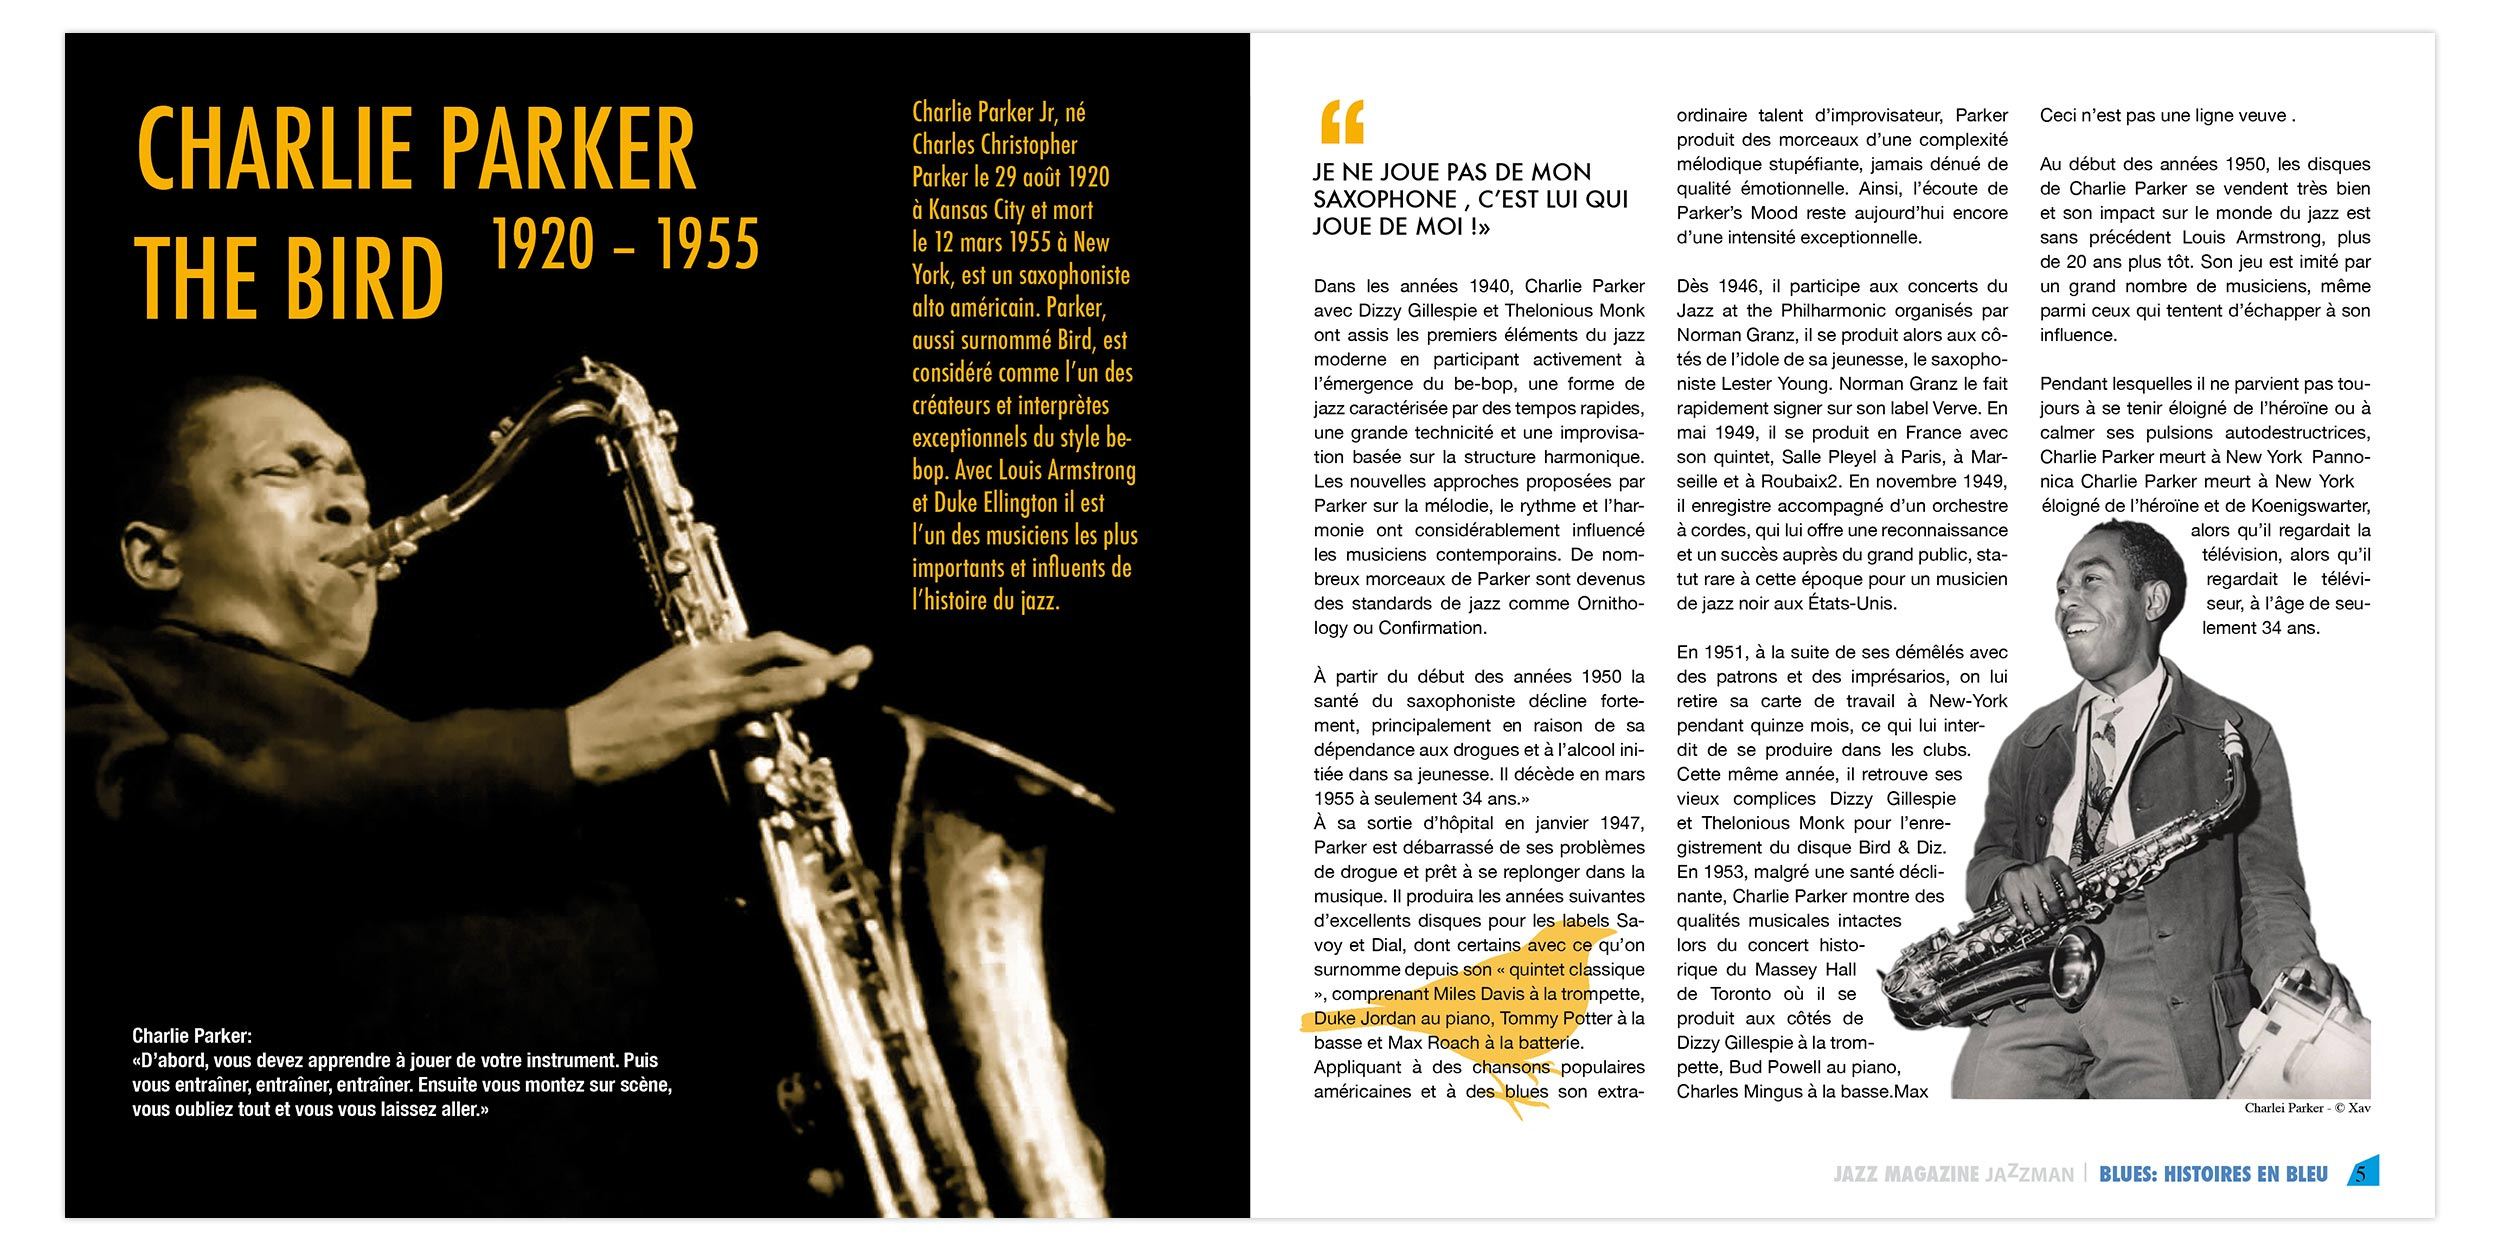 Magazine Apprendre La Photo jazz supplement magazine spreads — leon griffaton